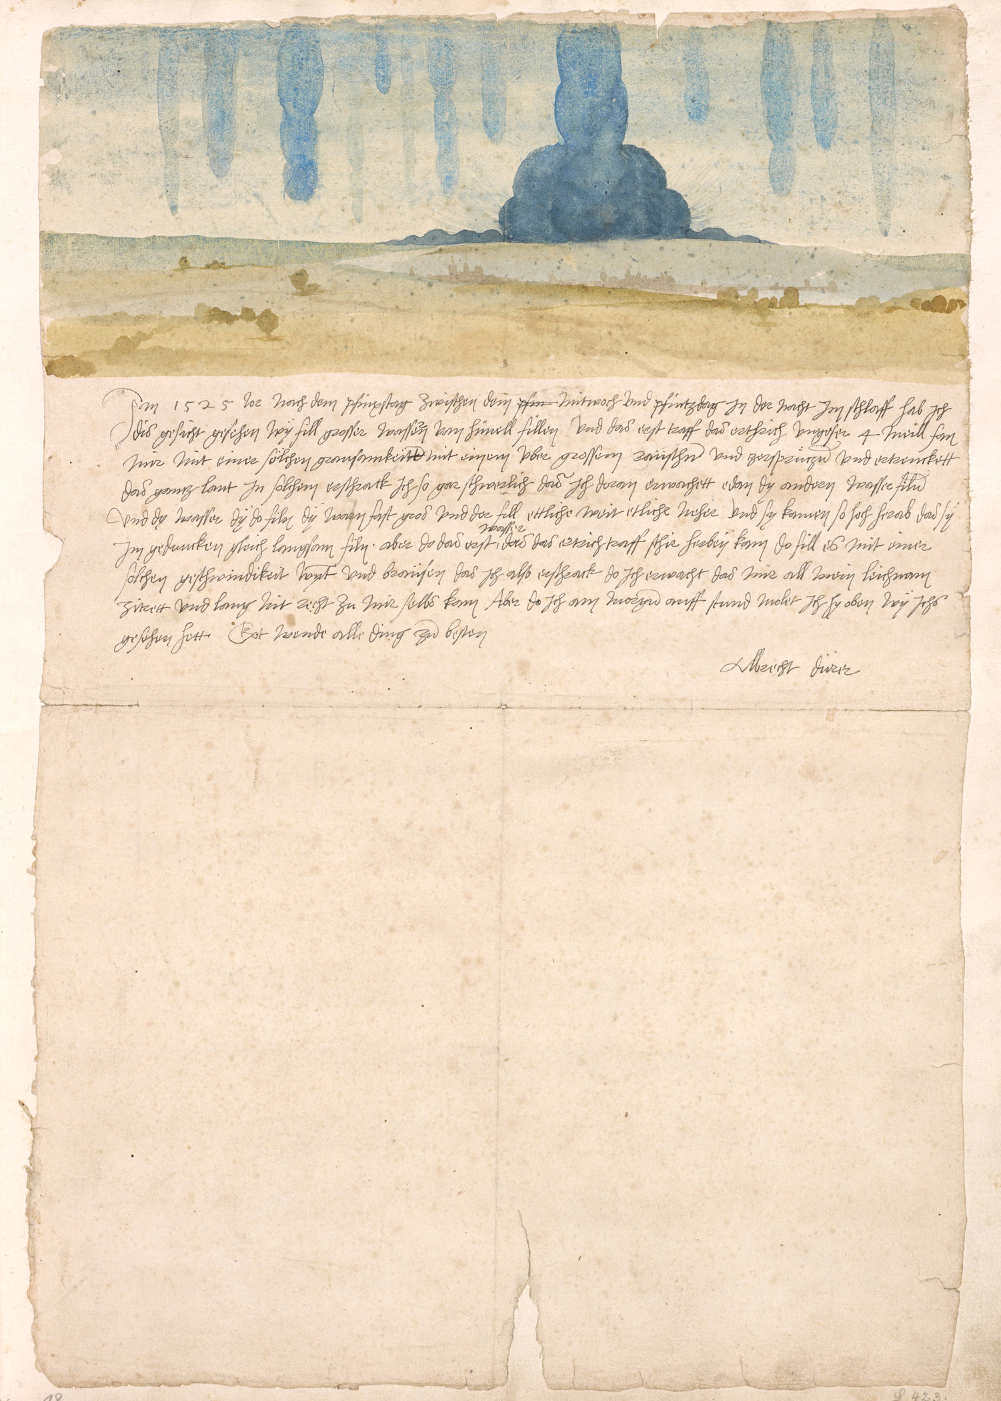 Albrecht Dürer, Traumgesicht, 1525, Aquarell, bezeichnet und signiert, 22,2 × 30,1 cm, in: Kunstbuch Albrecht Dürers (Wien, Kunsthistorisches Museum, Kunstkammer © KHM-Museumsverband)